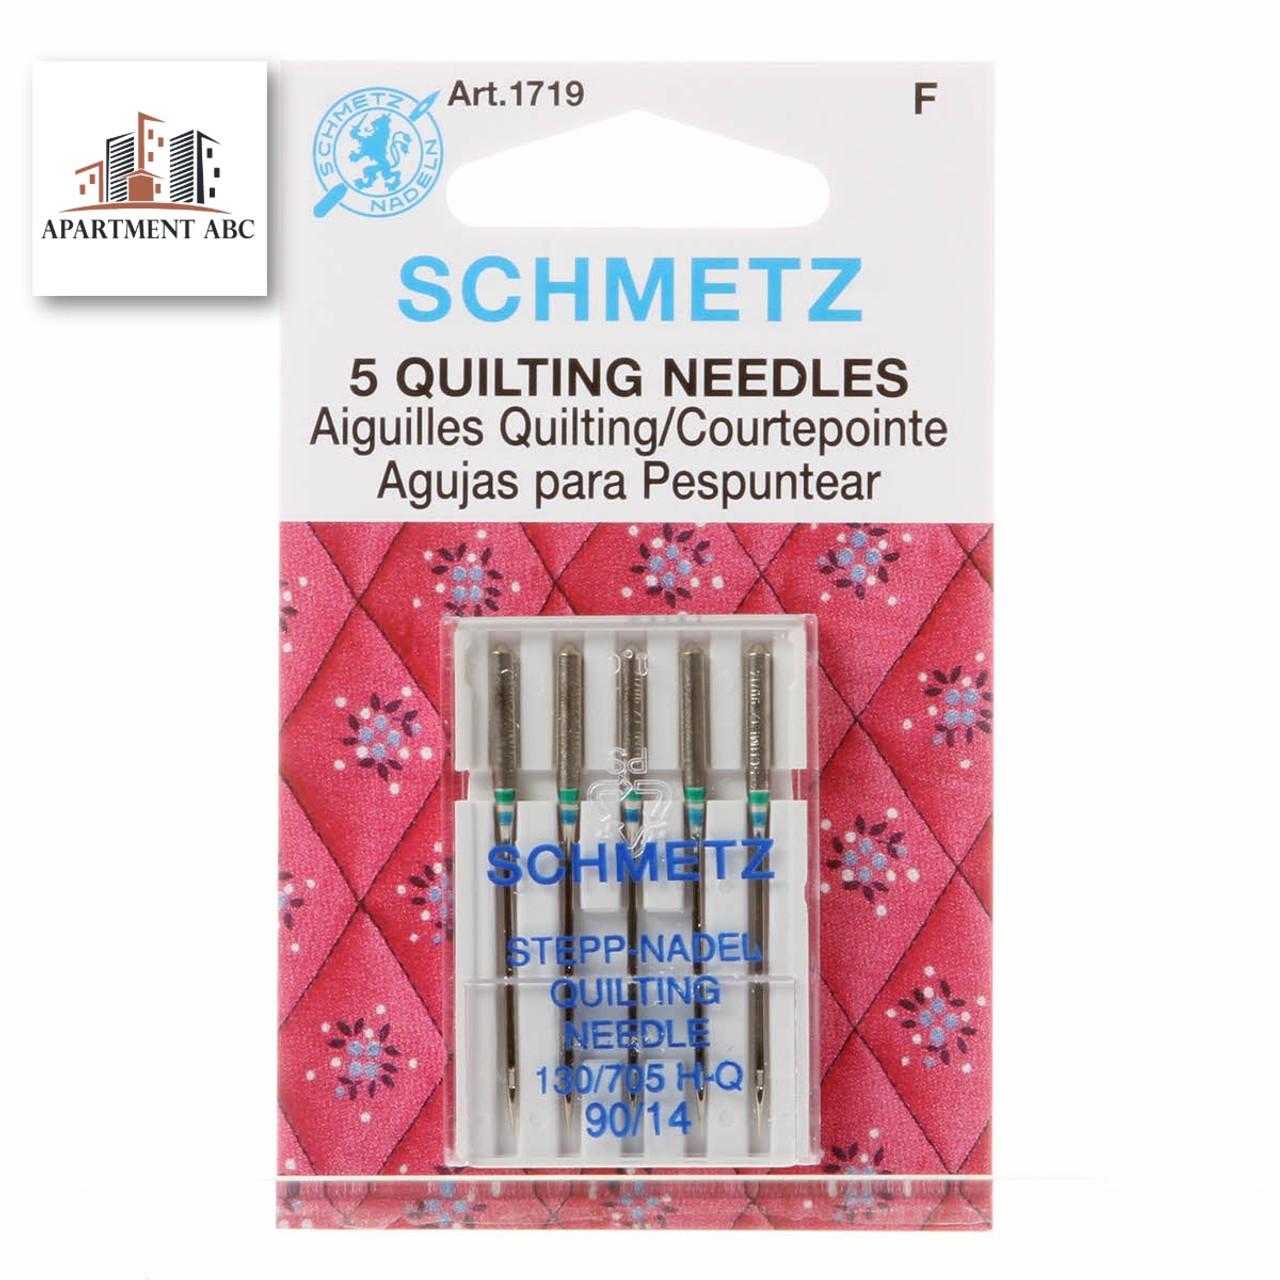 30 SCHMETZ SEWING MACHINE NEEDLES FITS BERNINA BROTHER PFAFF JANOME//NEWHOME ++